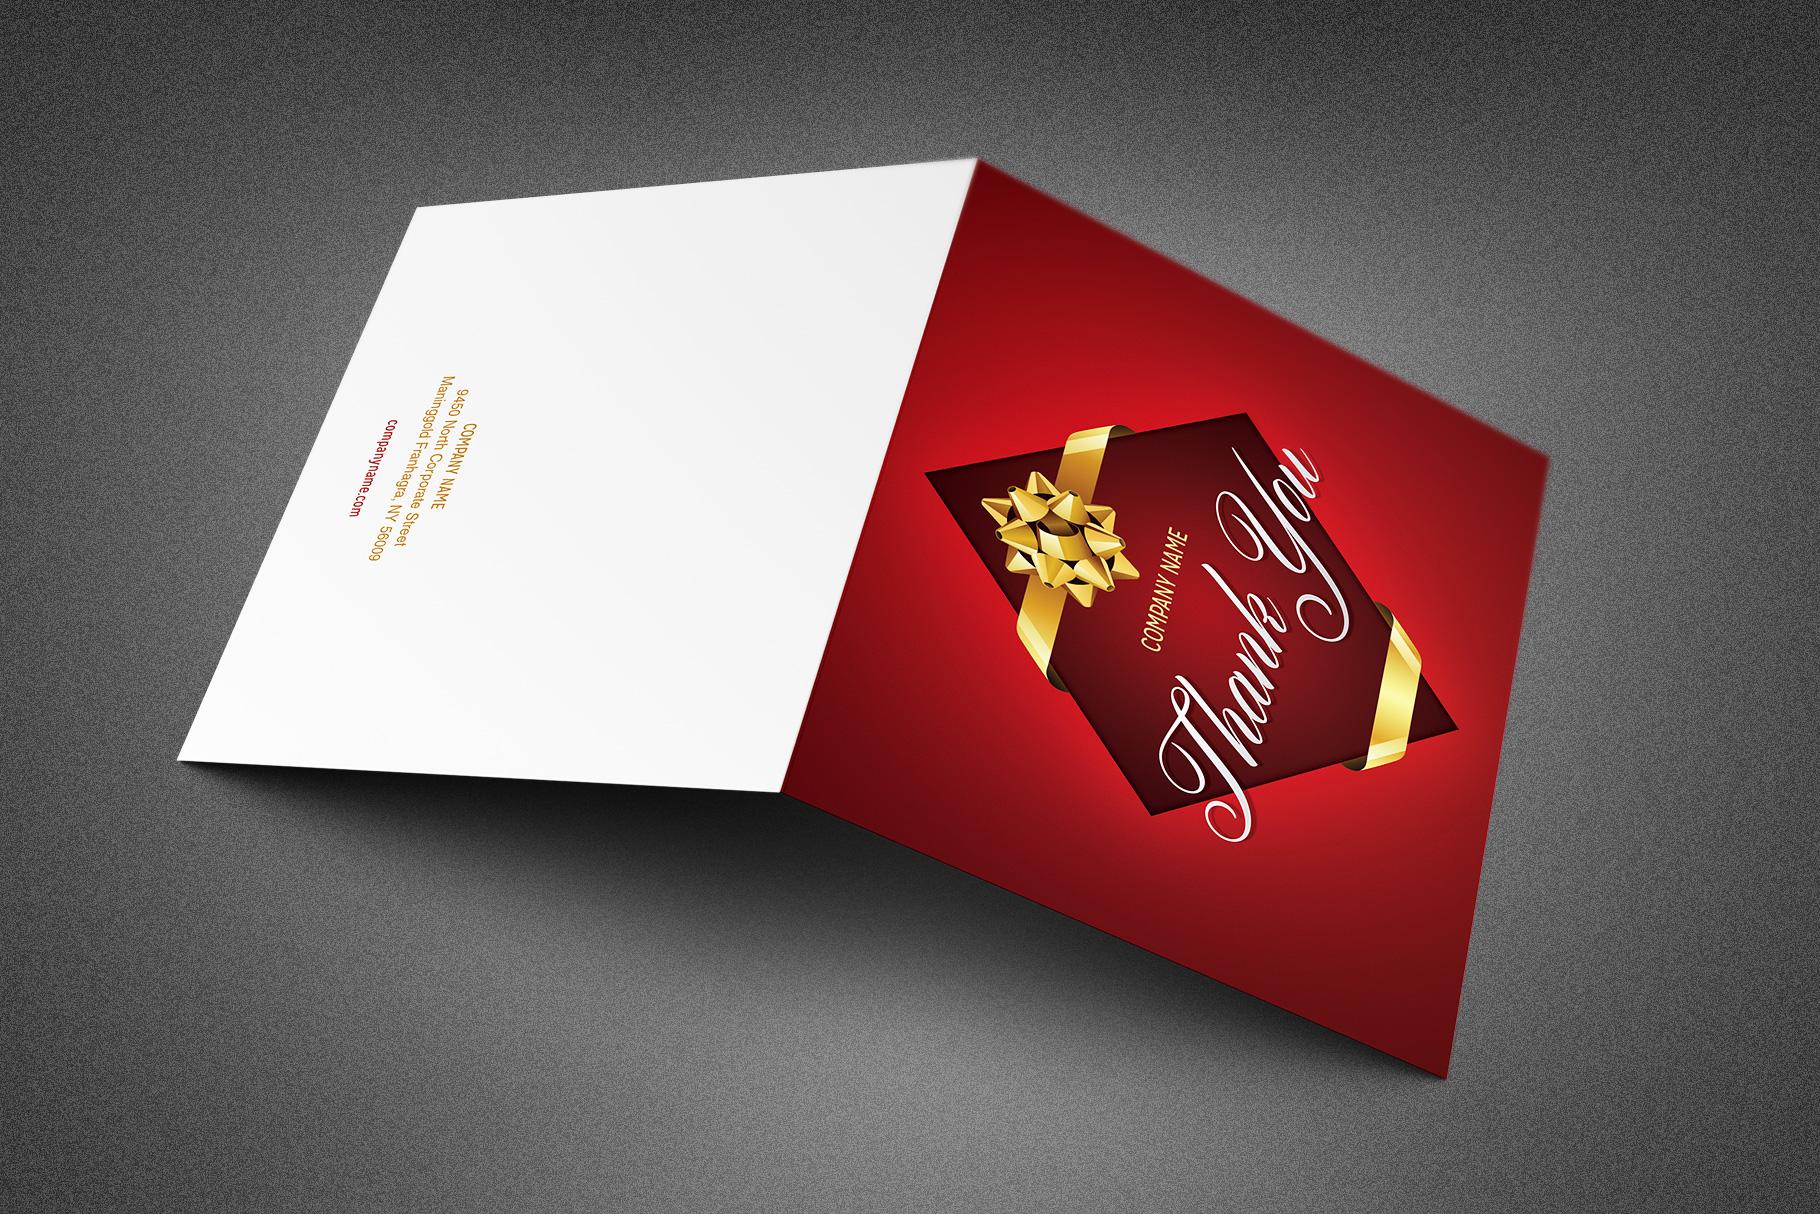 Company Christmas Thank You Card example image 2